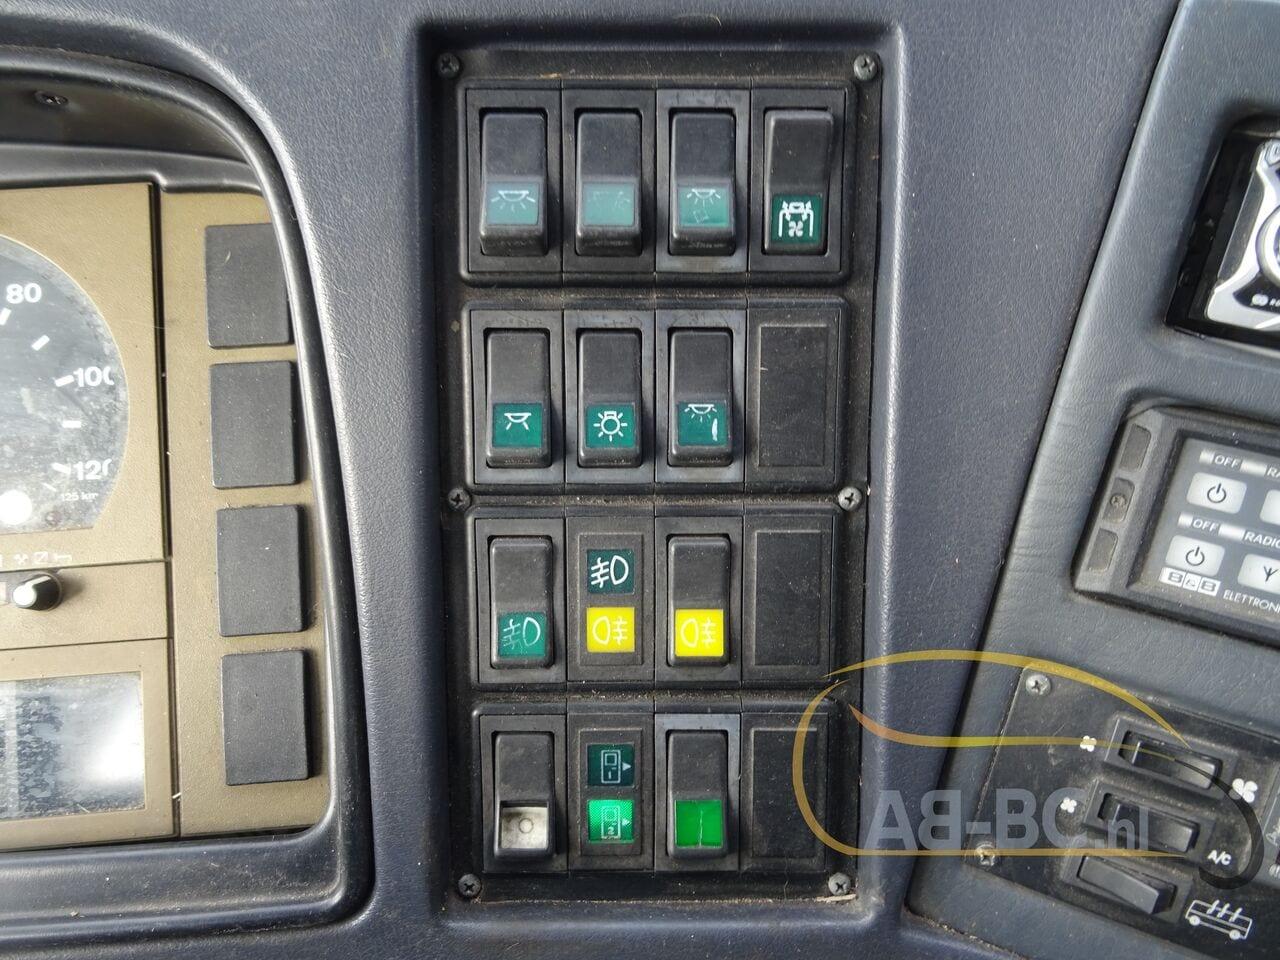 coach-busTEMSA-Safari-RD-65-Seats---1620311903601691678_big_6995c7637389cb53dbafdf898f4e90c0--21050617272795316700